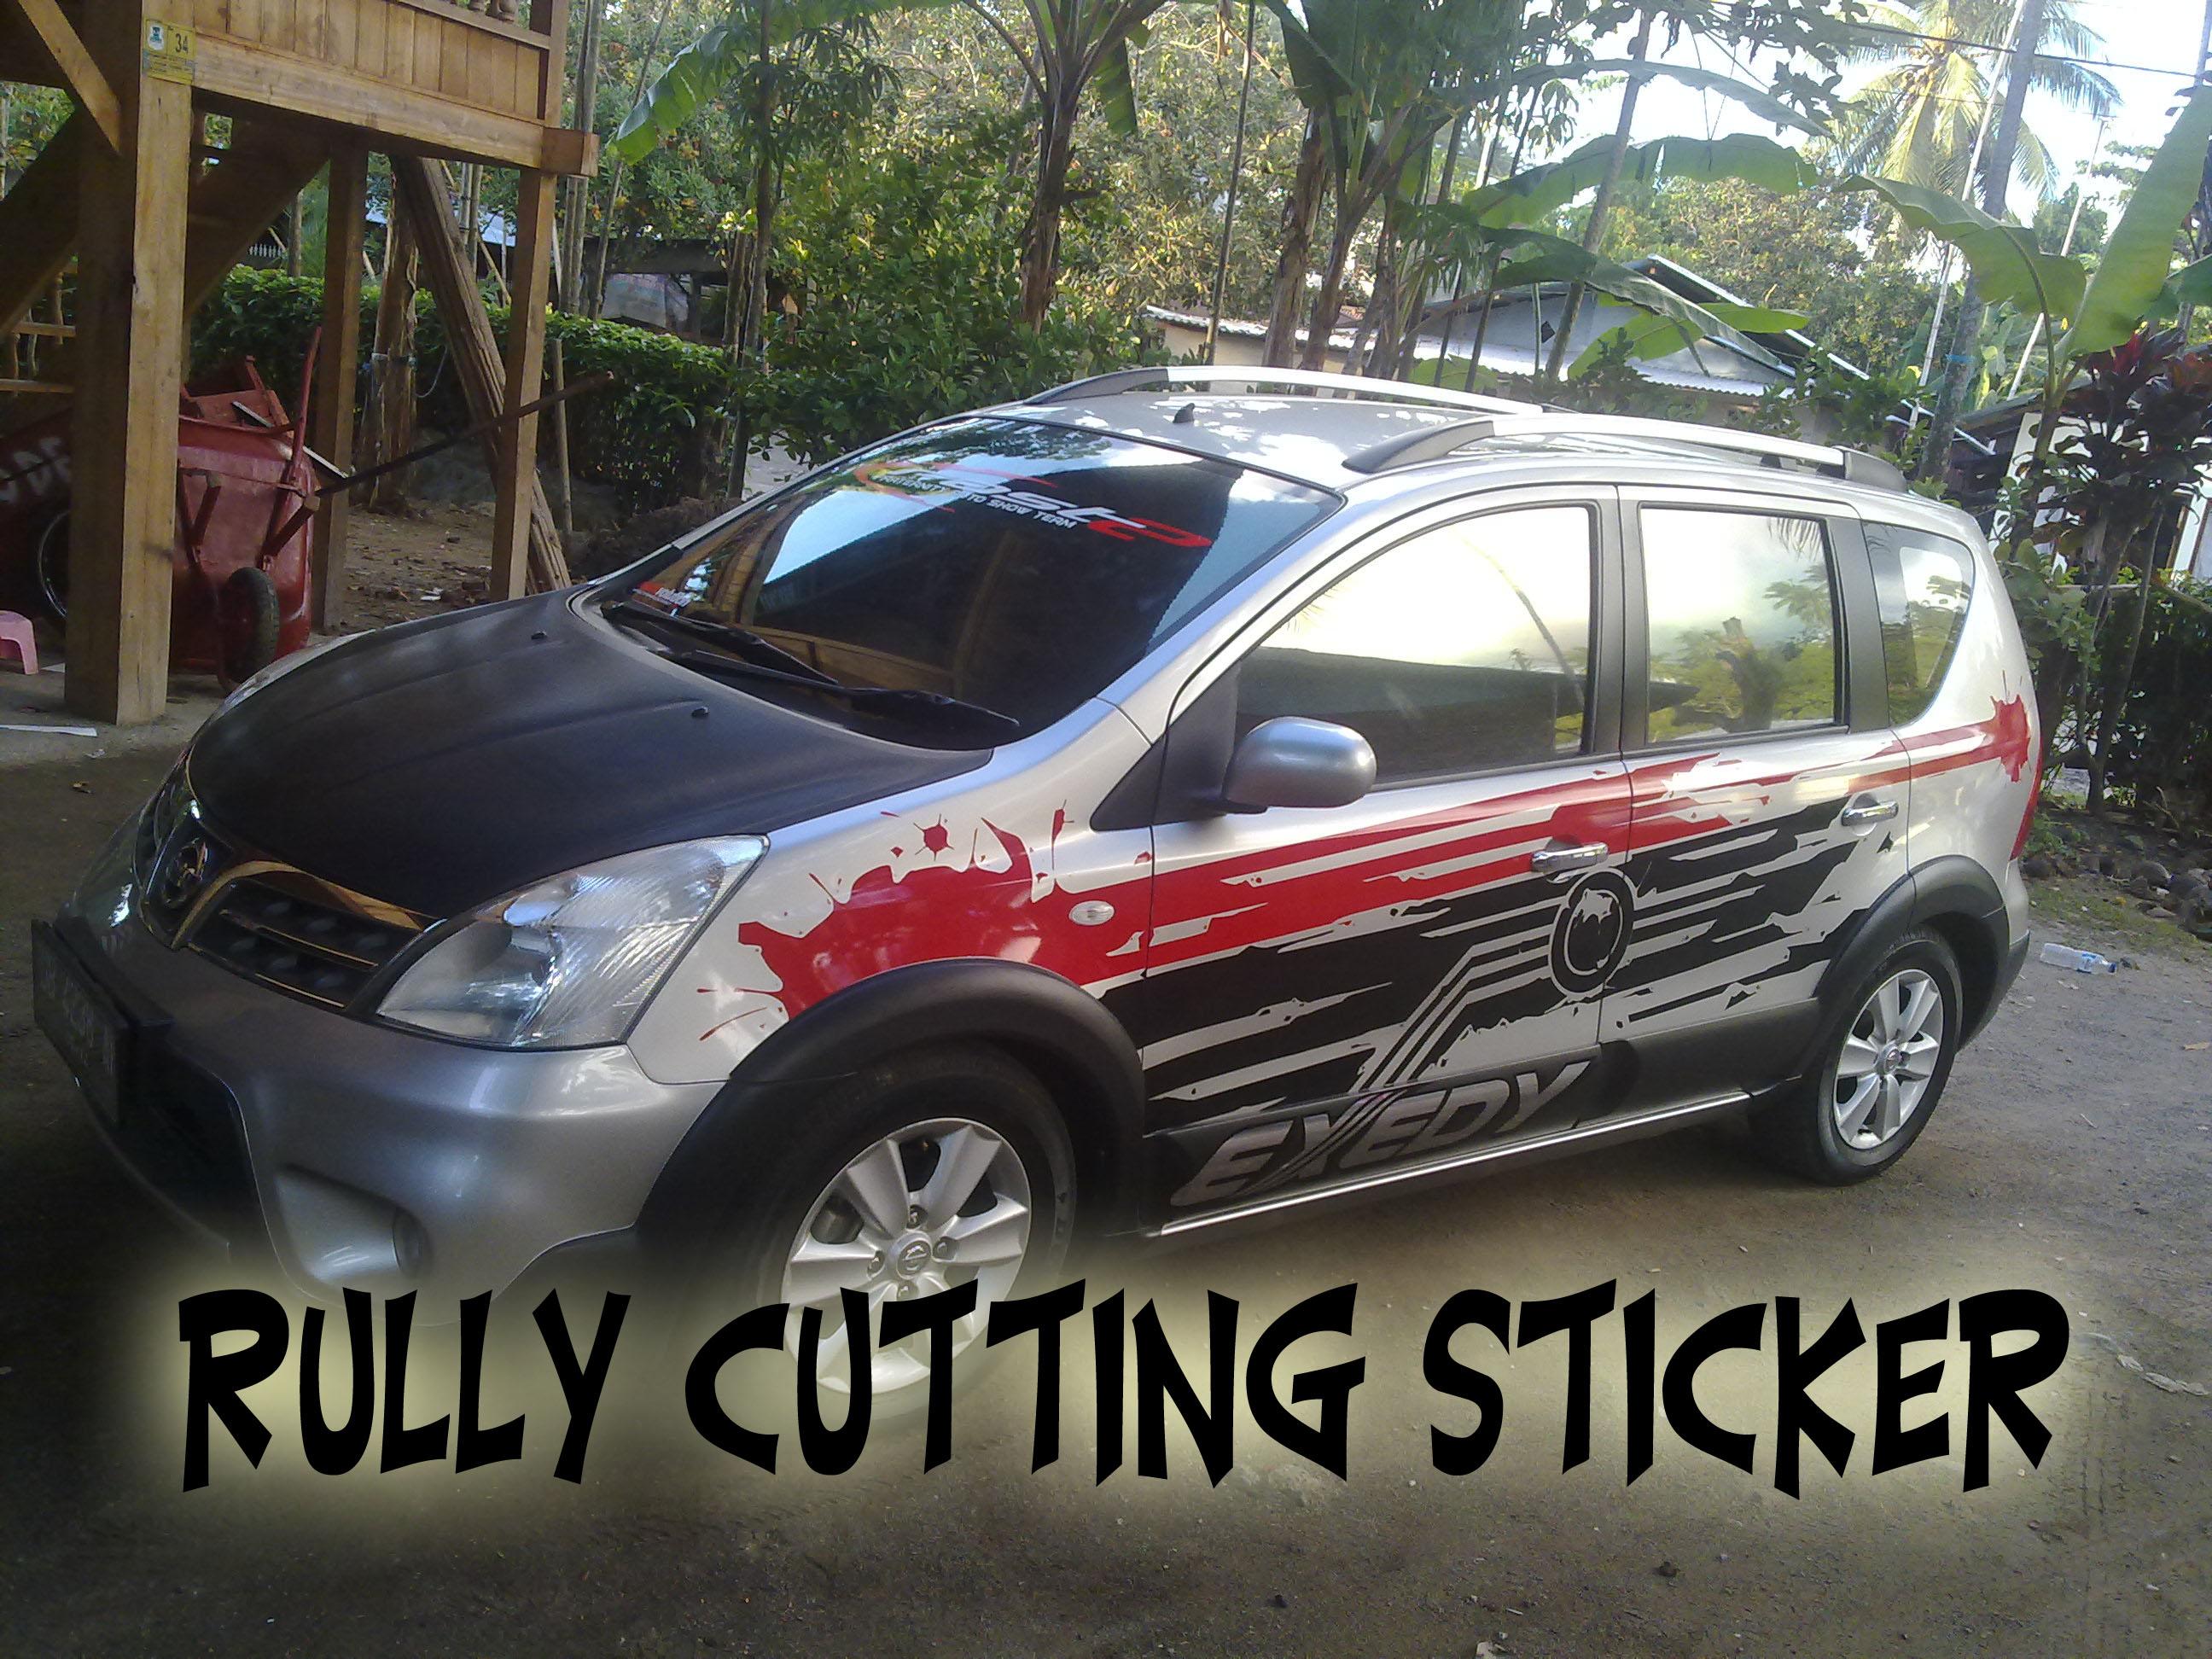 cutting sticker grand new avanza veloz 1.5 2017 nissan livina rully r c s